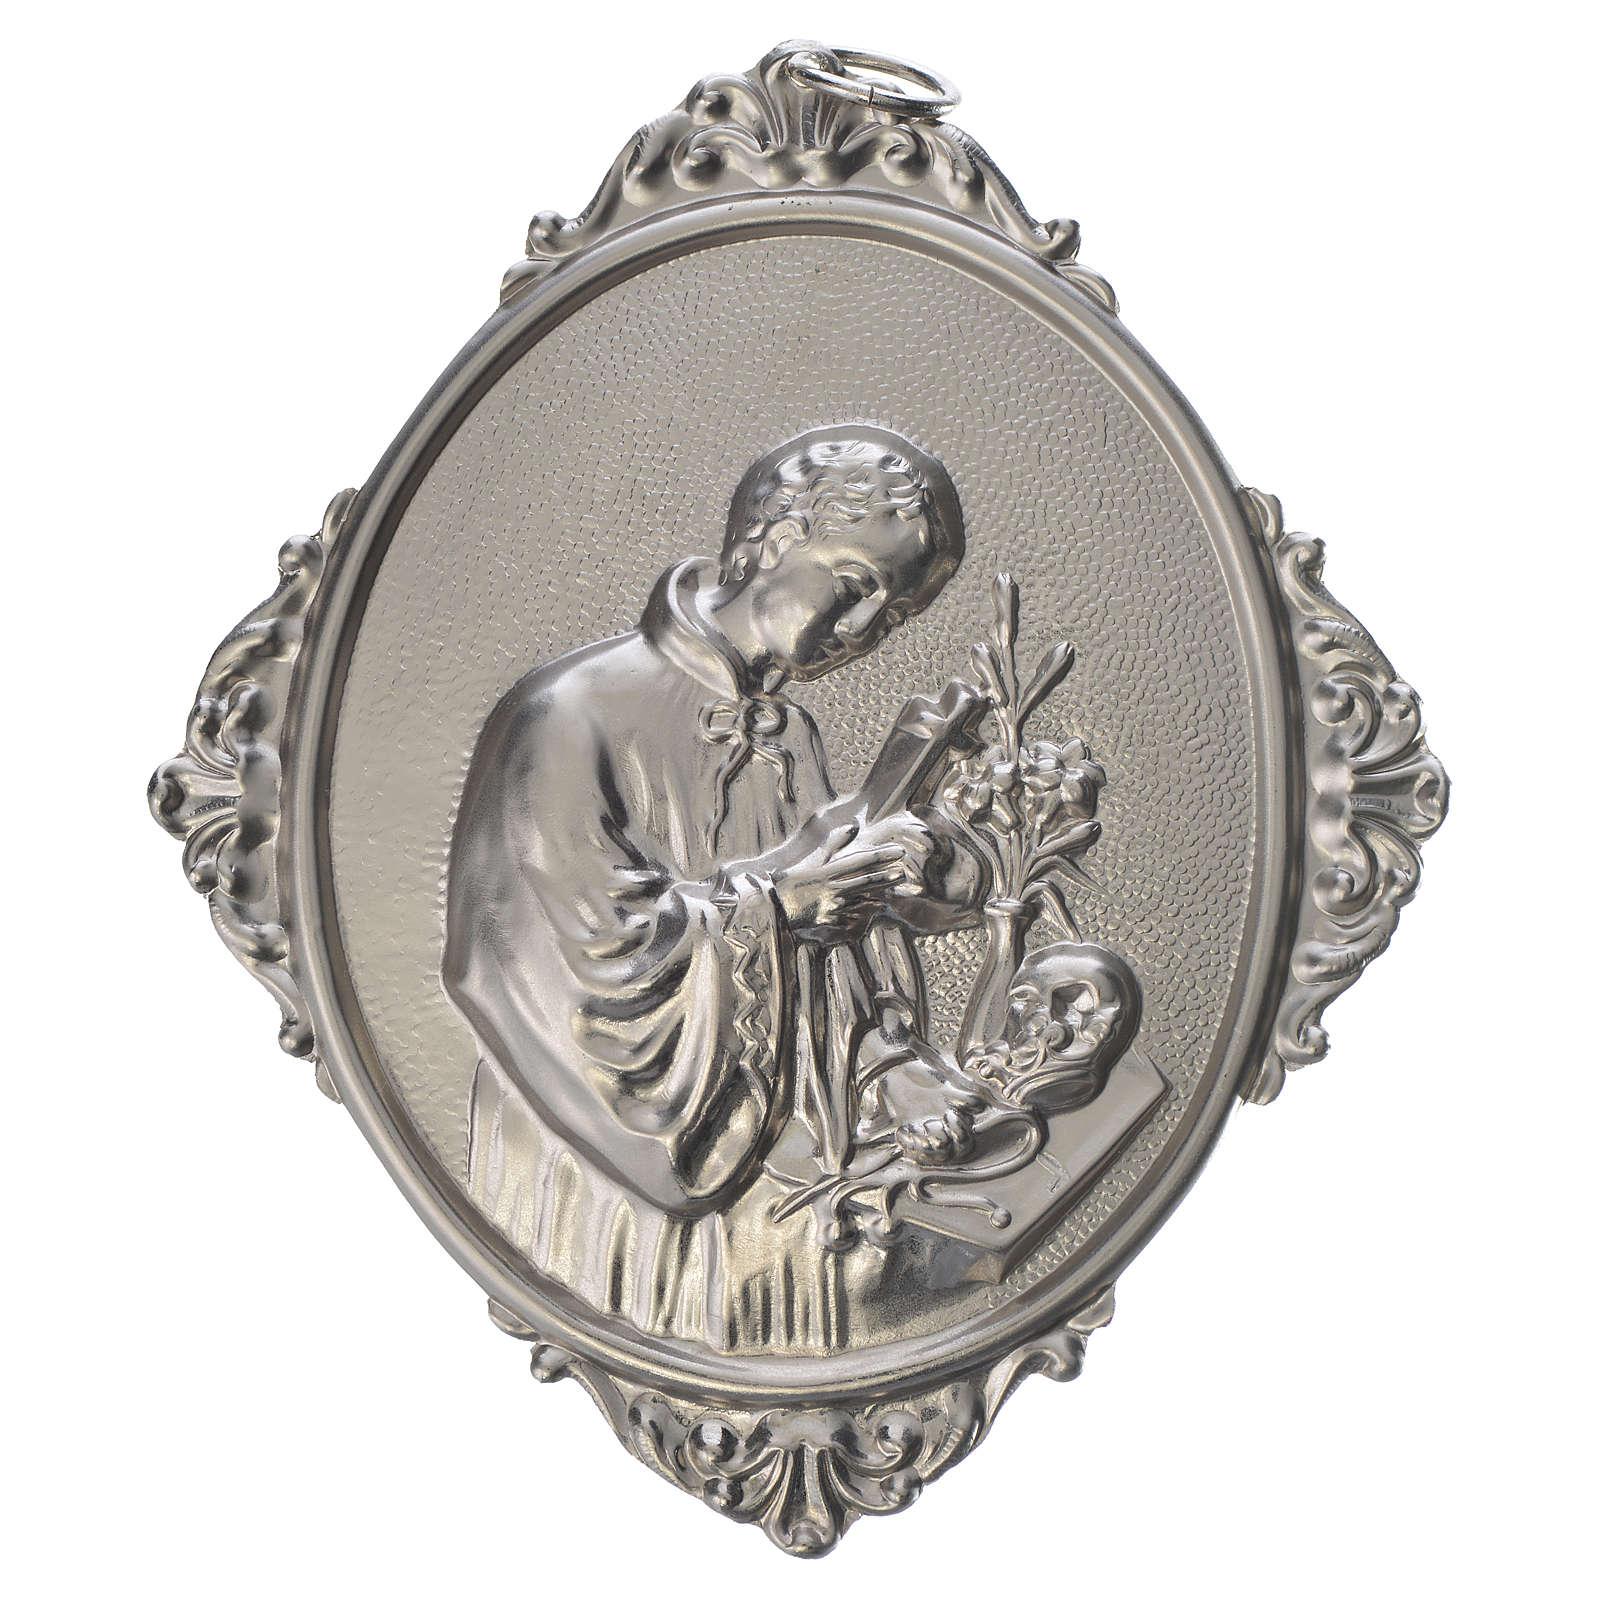 Confraternity Medal in metal, Saint Luigi 3